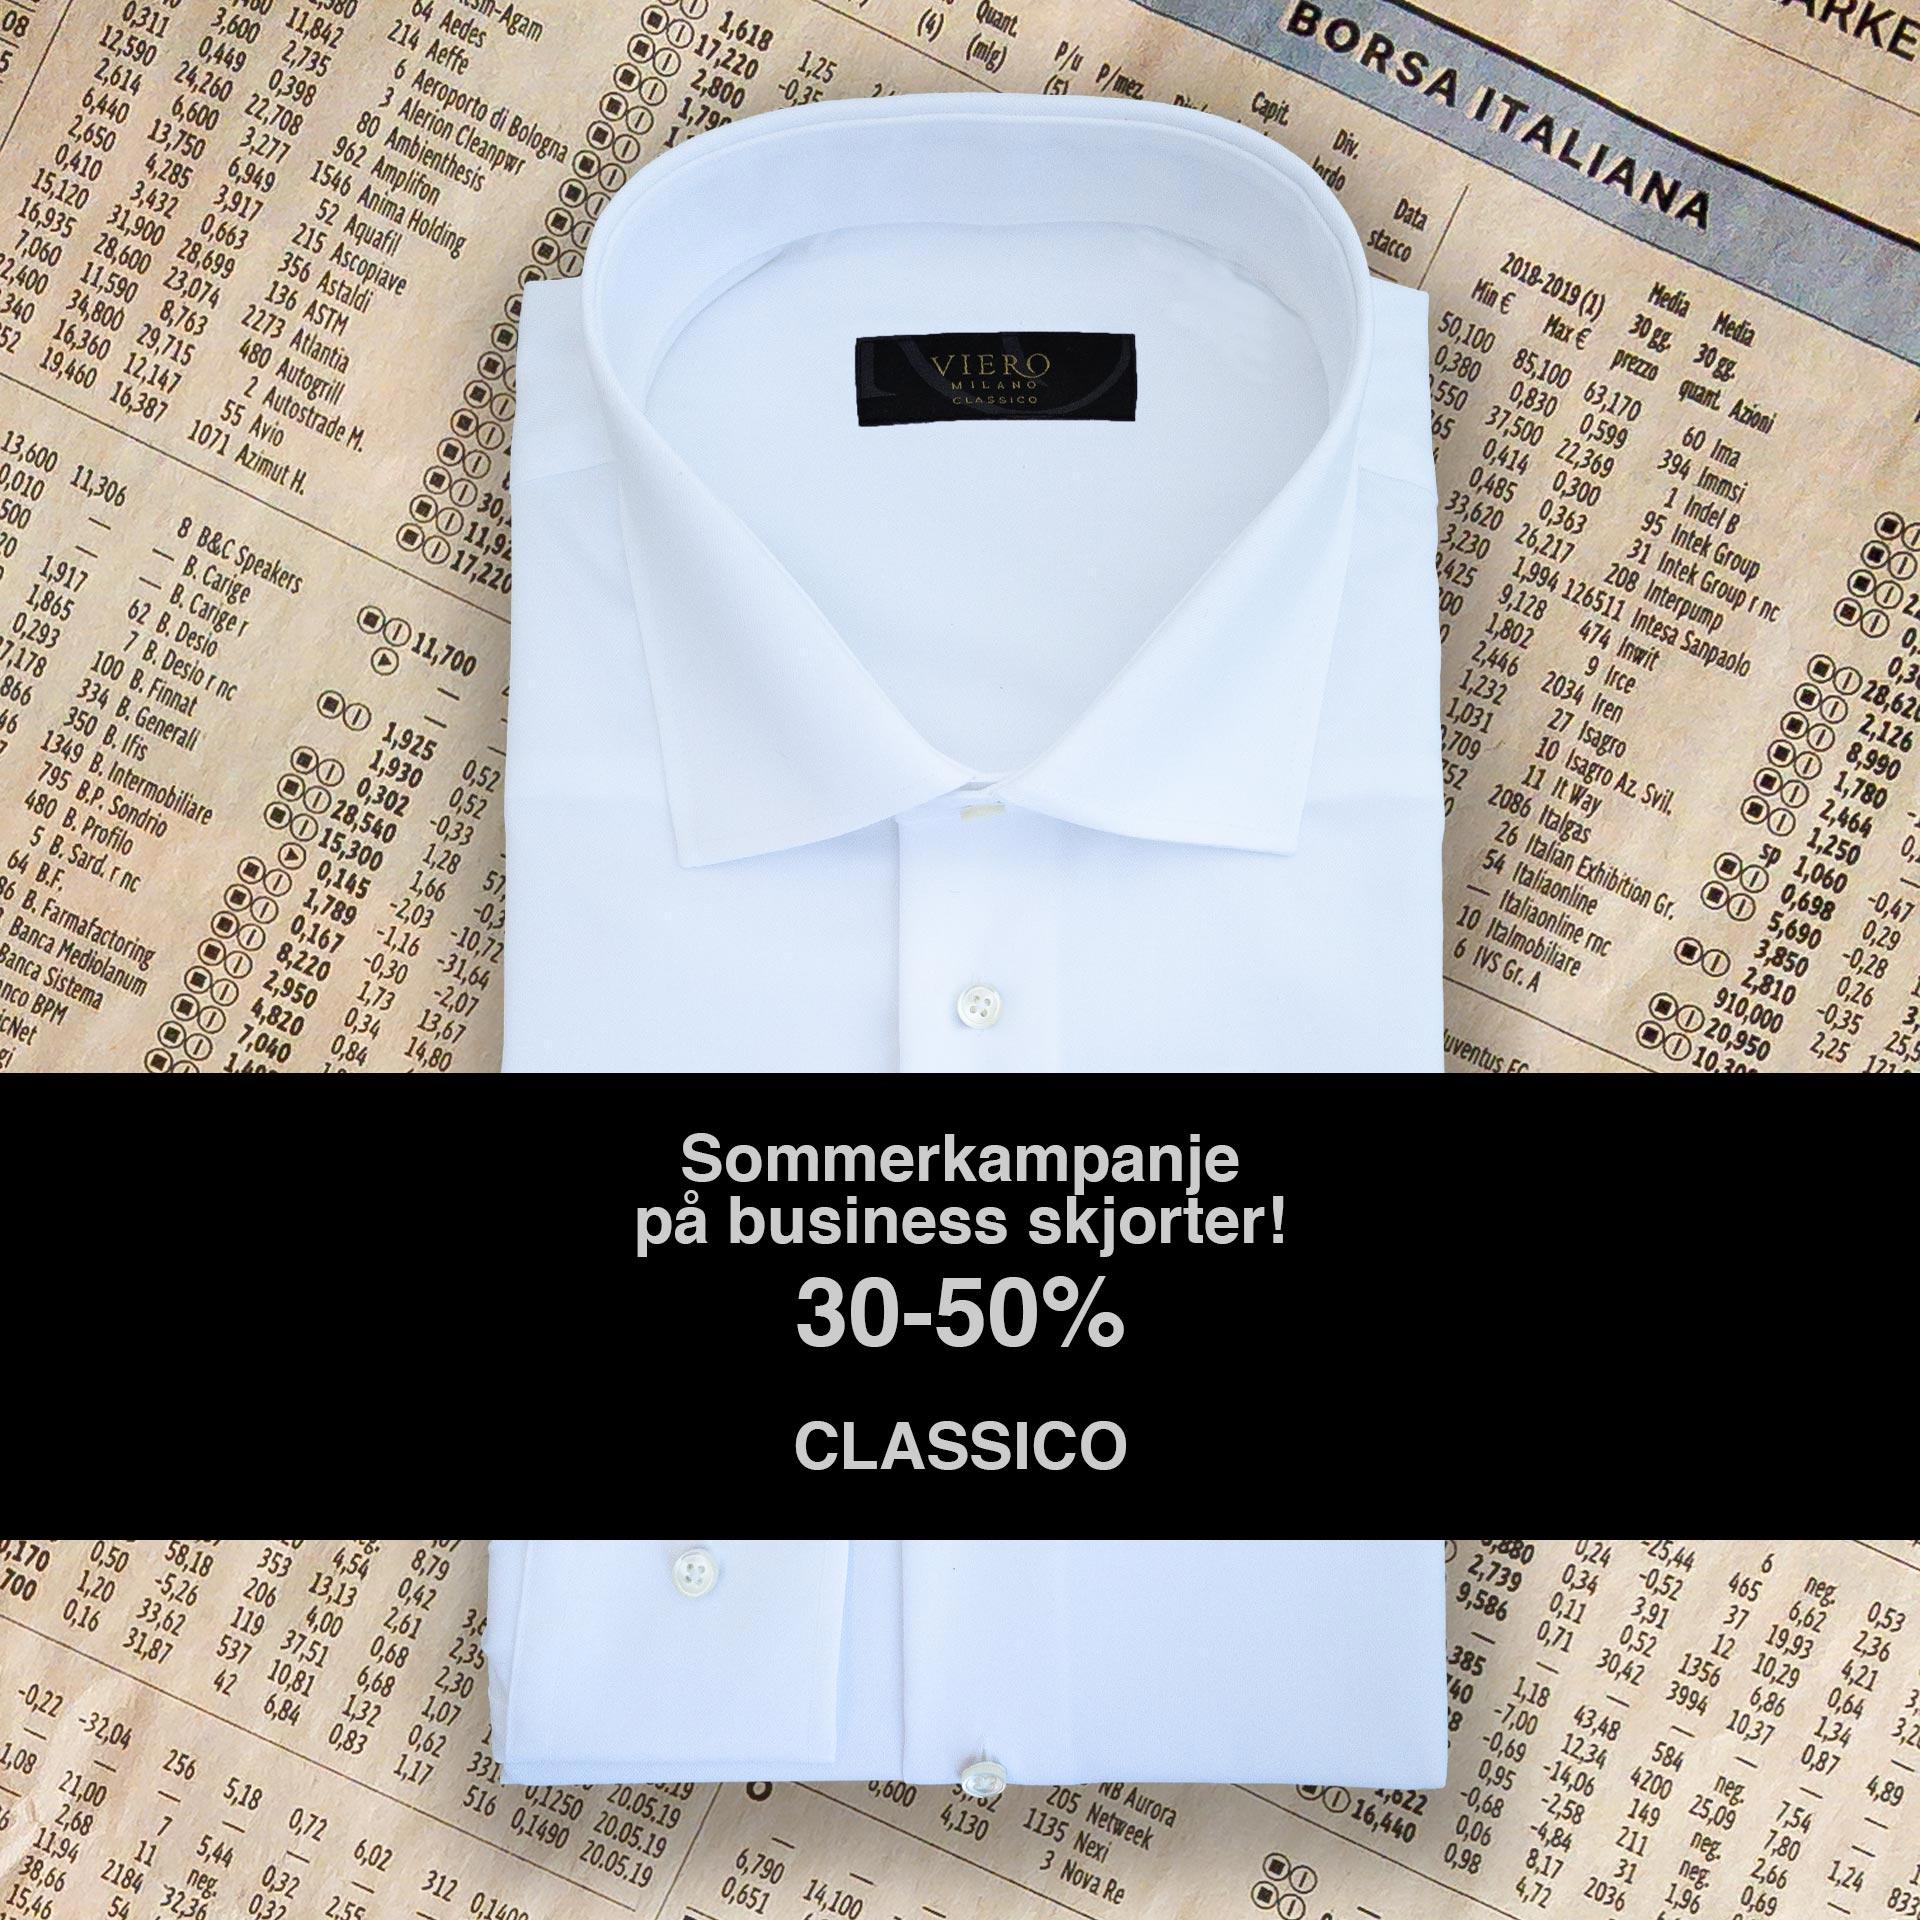 Sommerkampanje på classico skjorter!